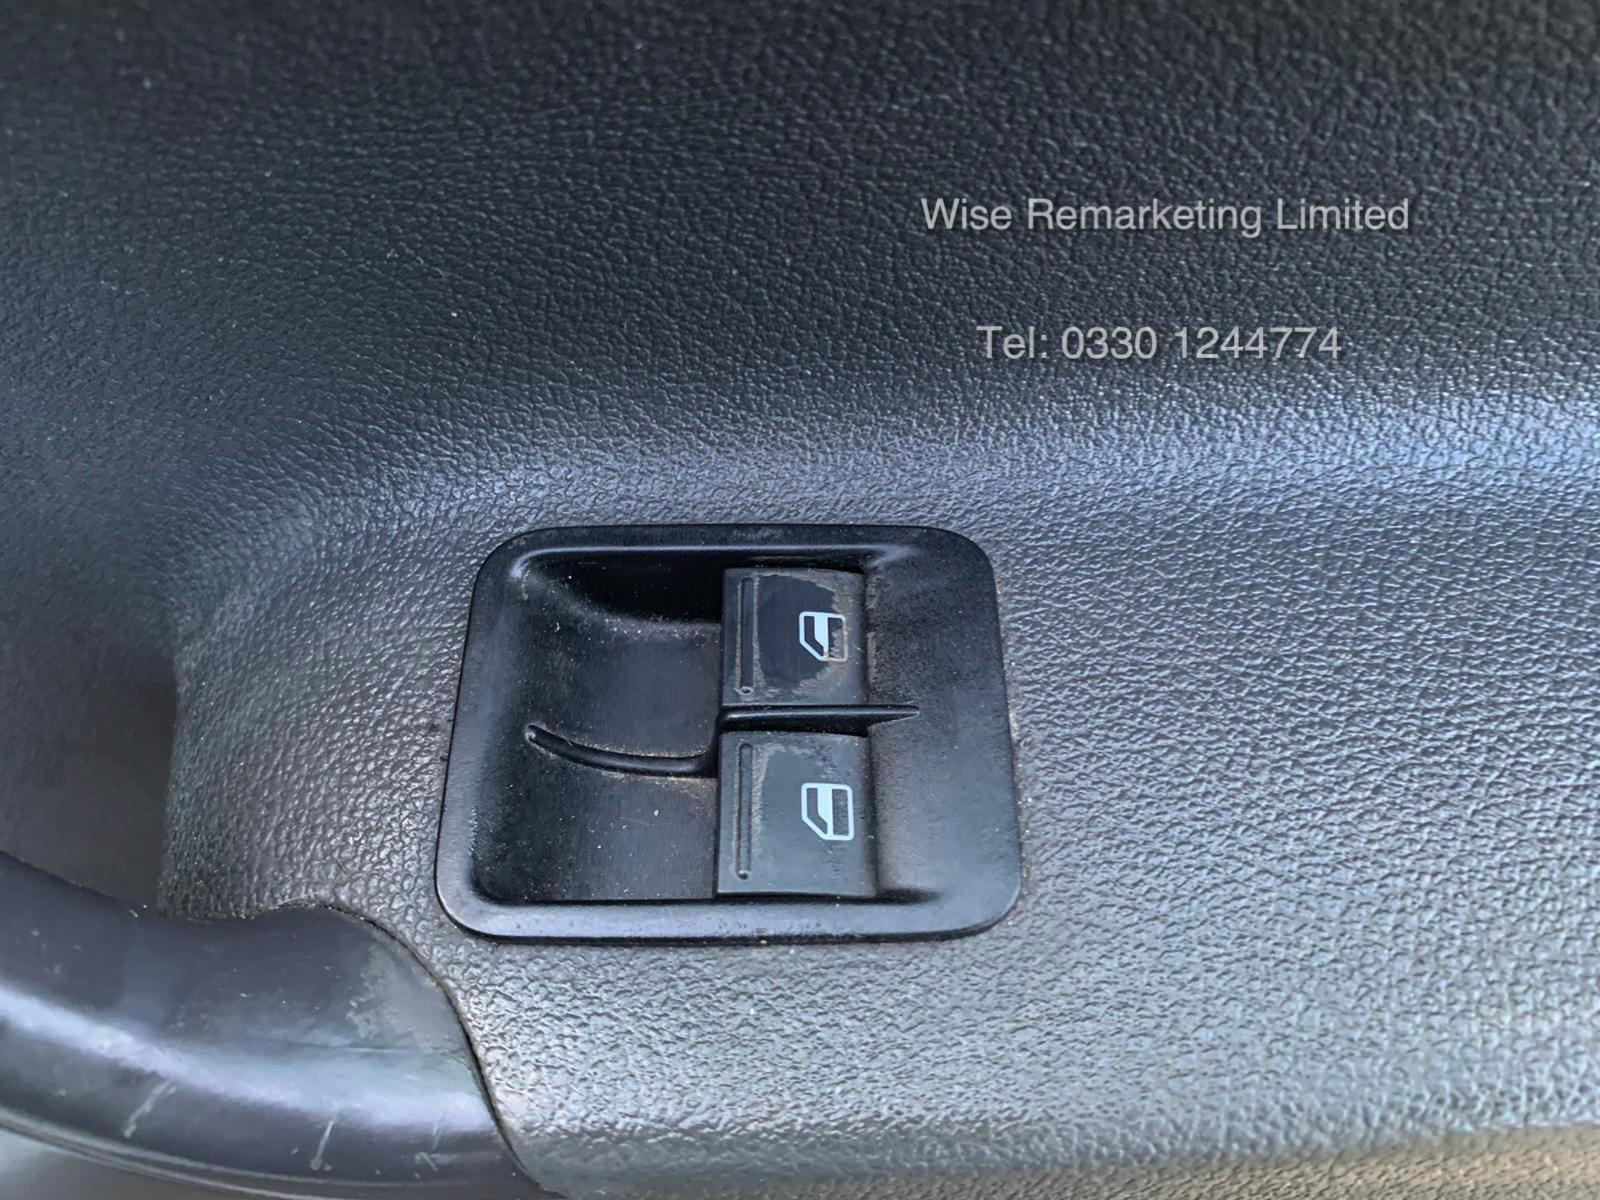 Volkswagen Caddy C20 1.6 TDI - 2013 13 Reg - Silver - Side Loading Door - Ply Lined - Image 16 of 18